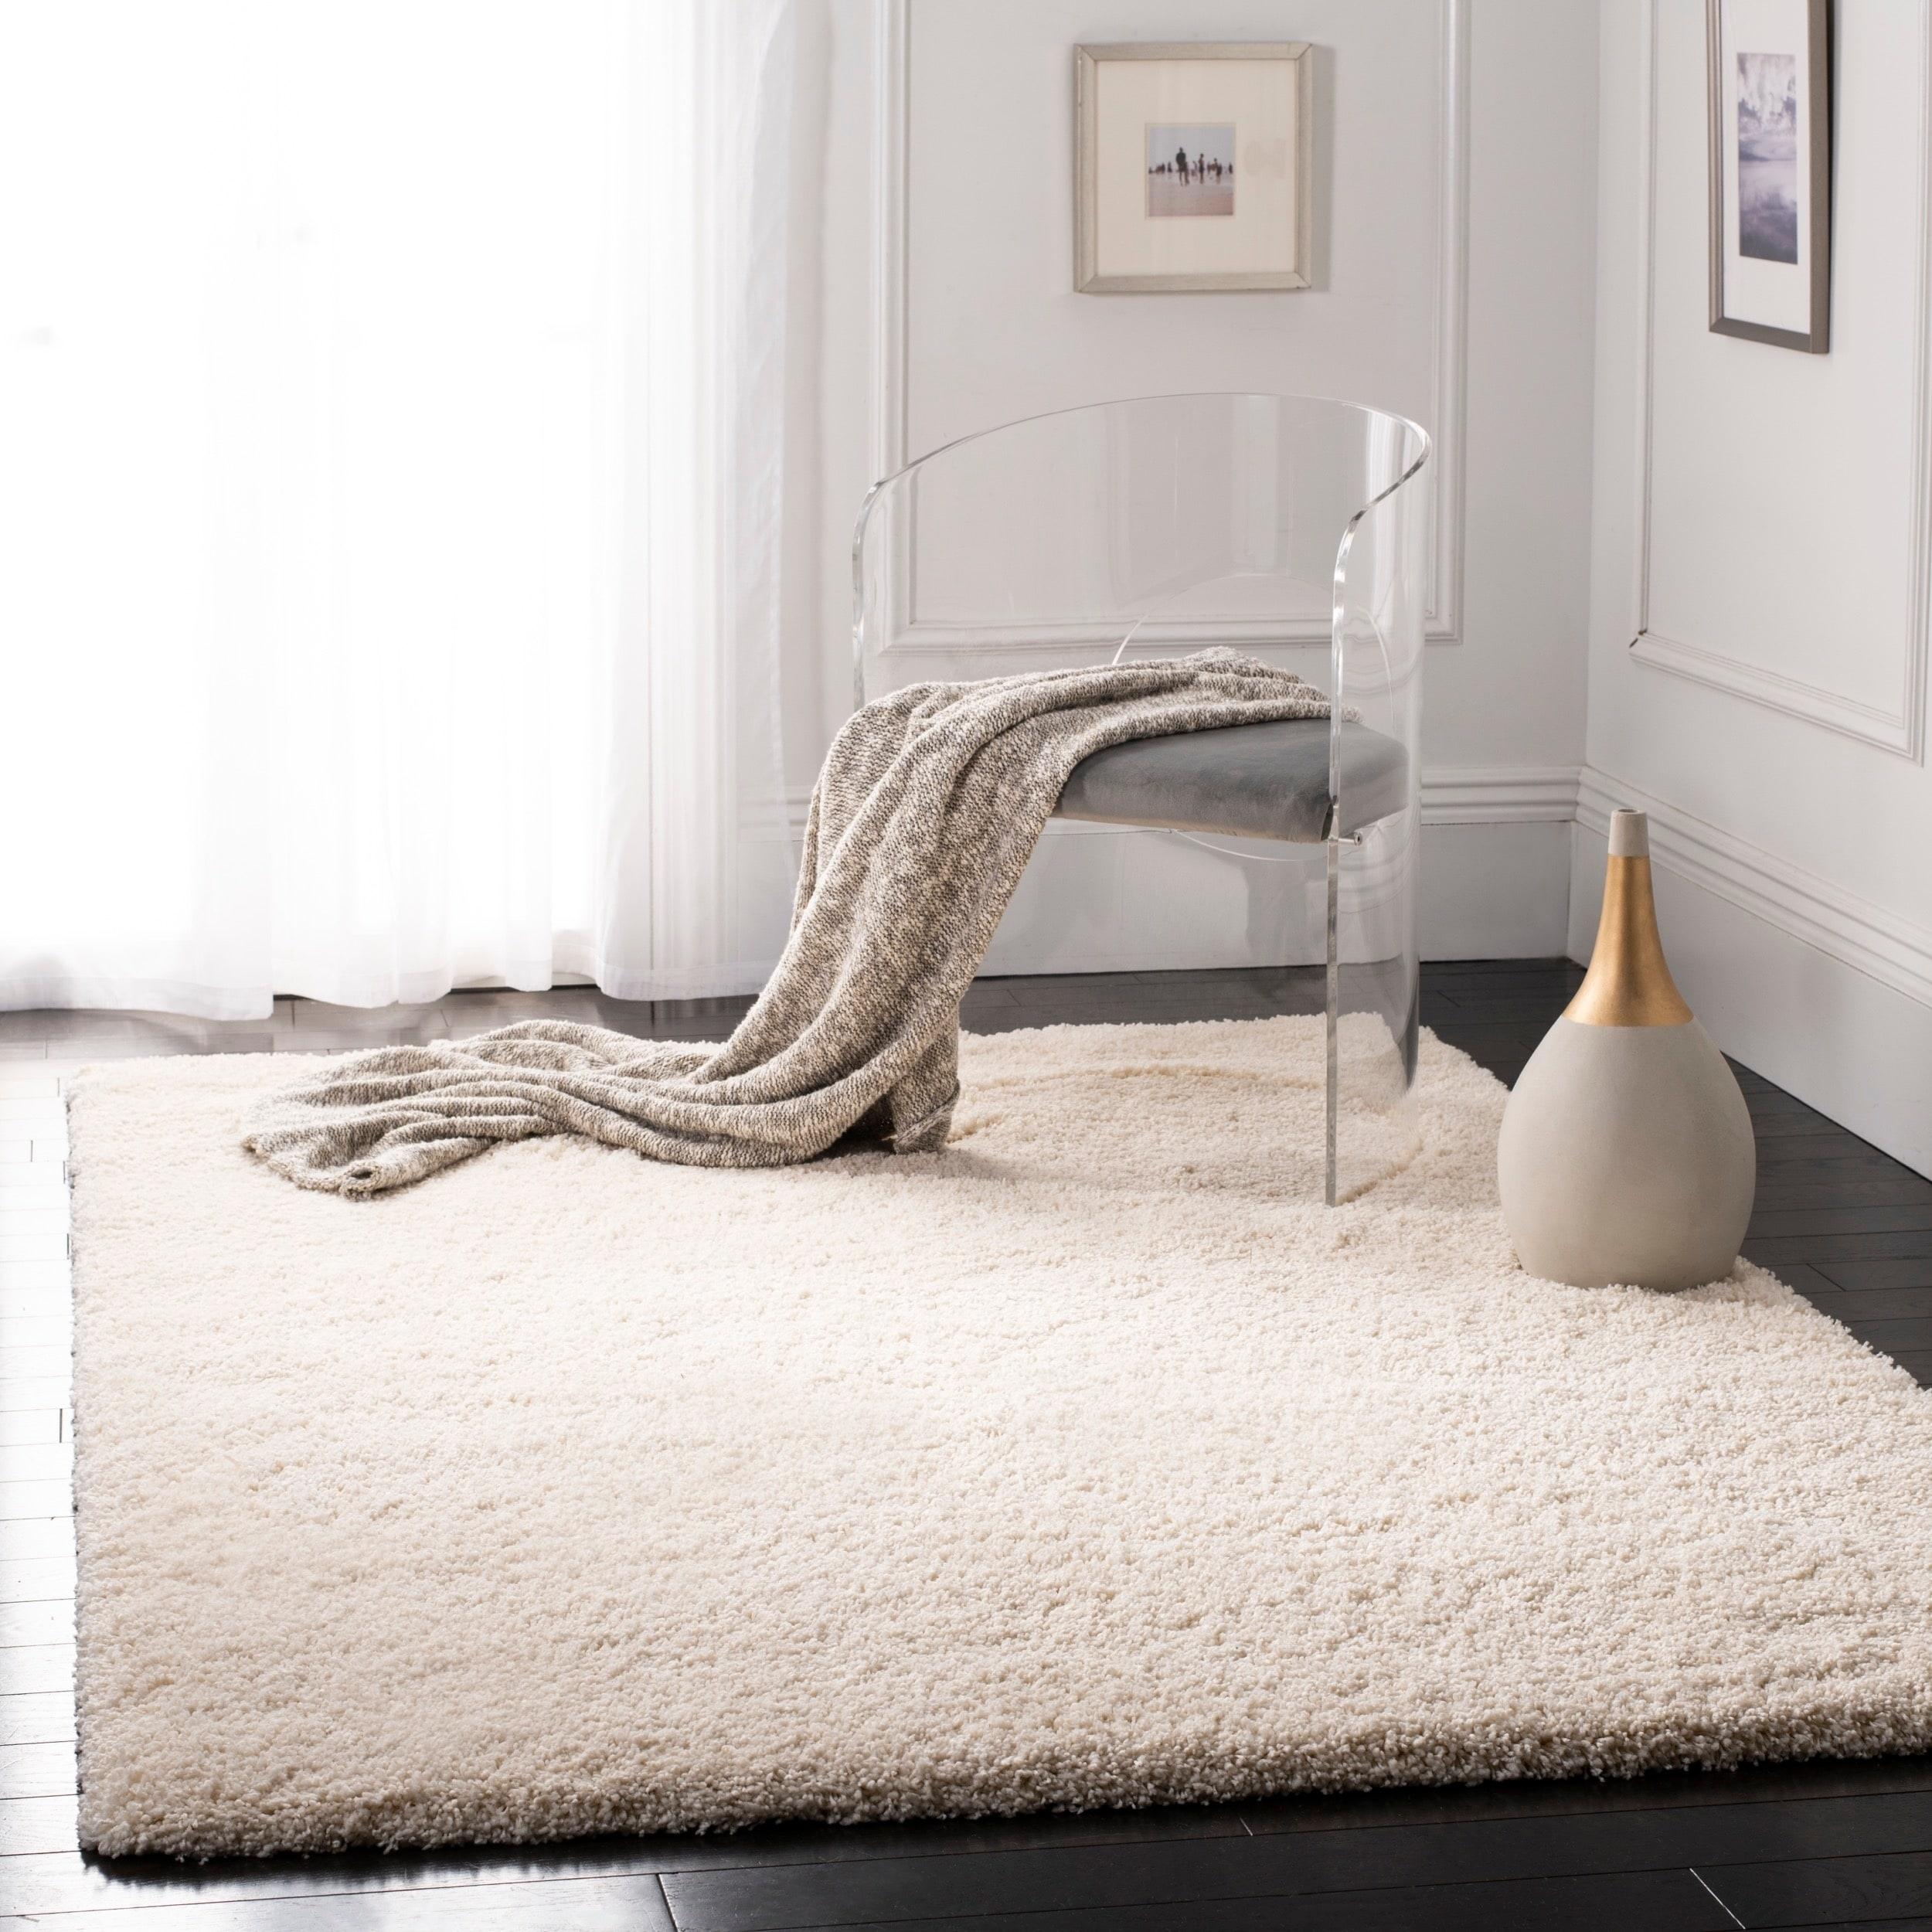 Safavieh California Cozy Plush Ivory Shag Rug (8'6 x 12')...